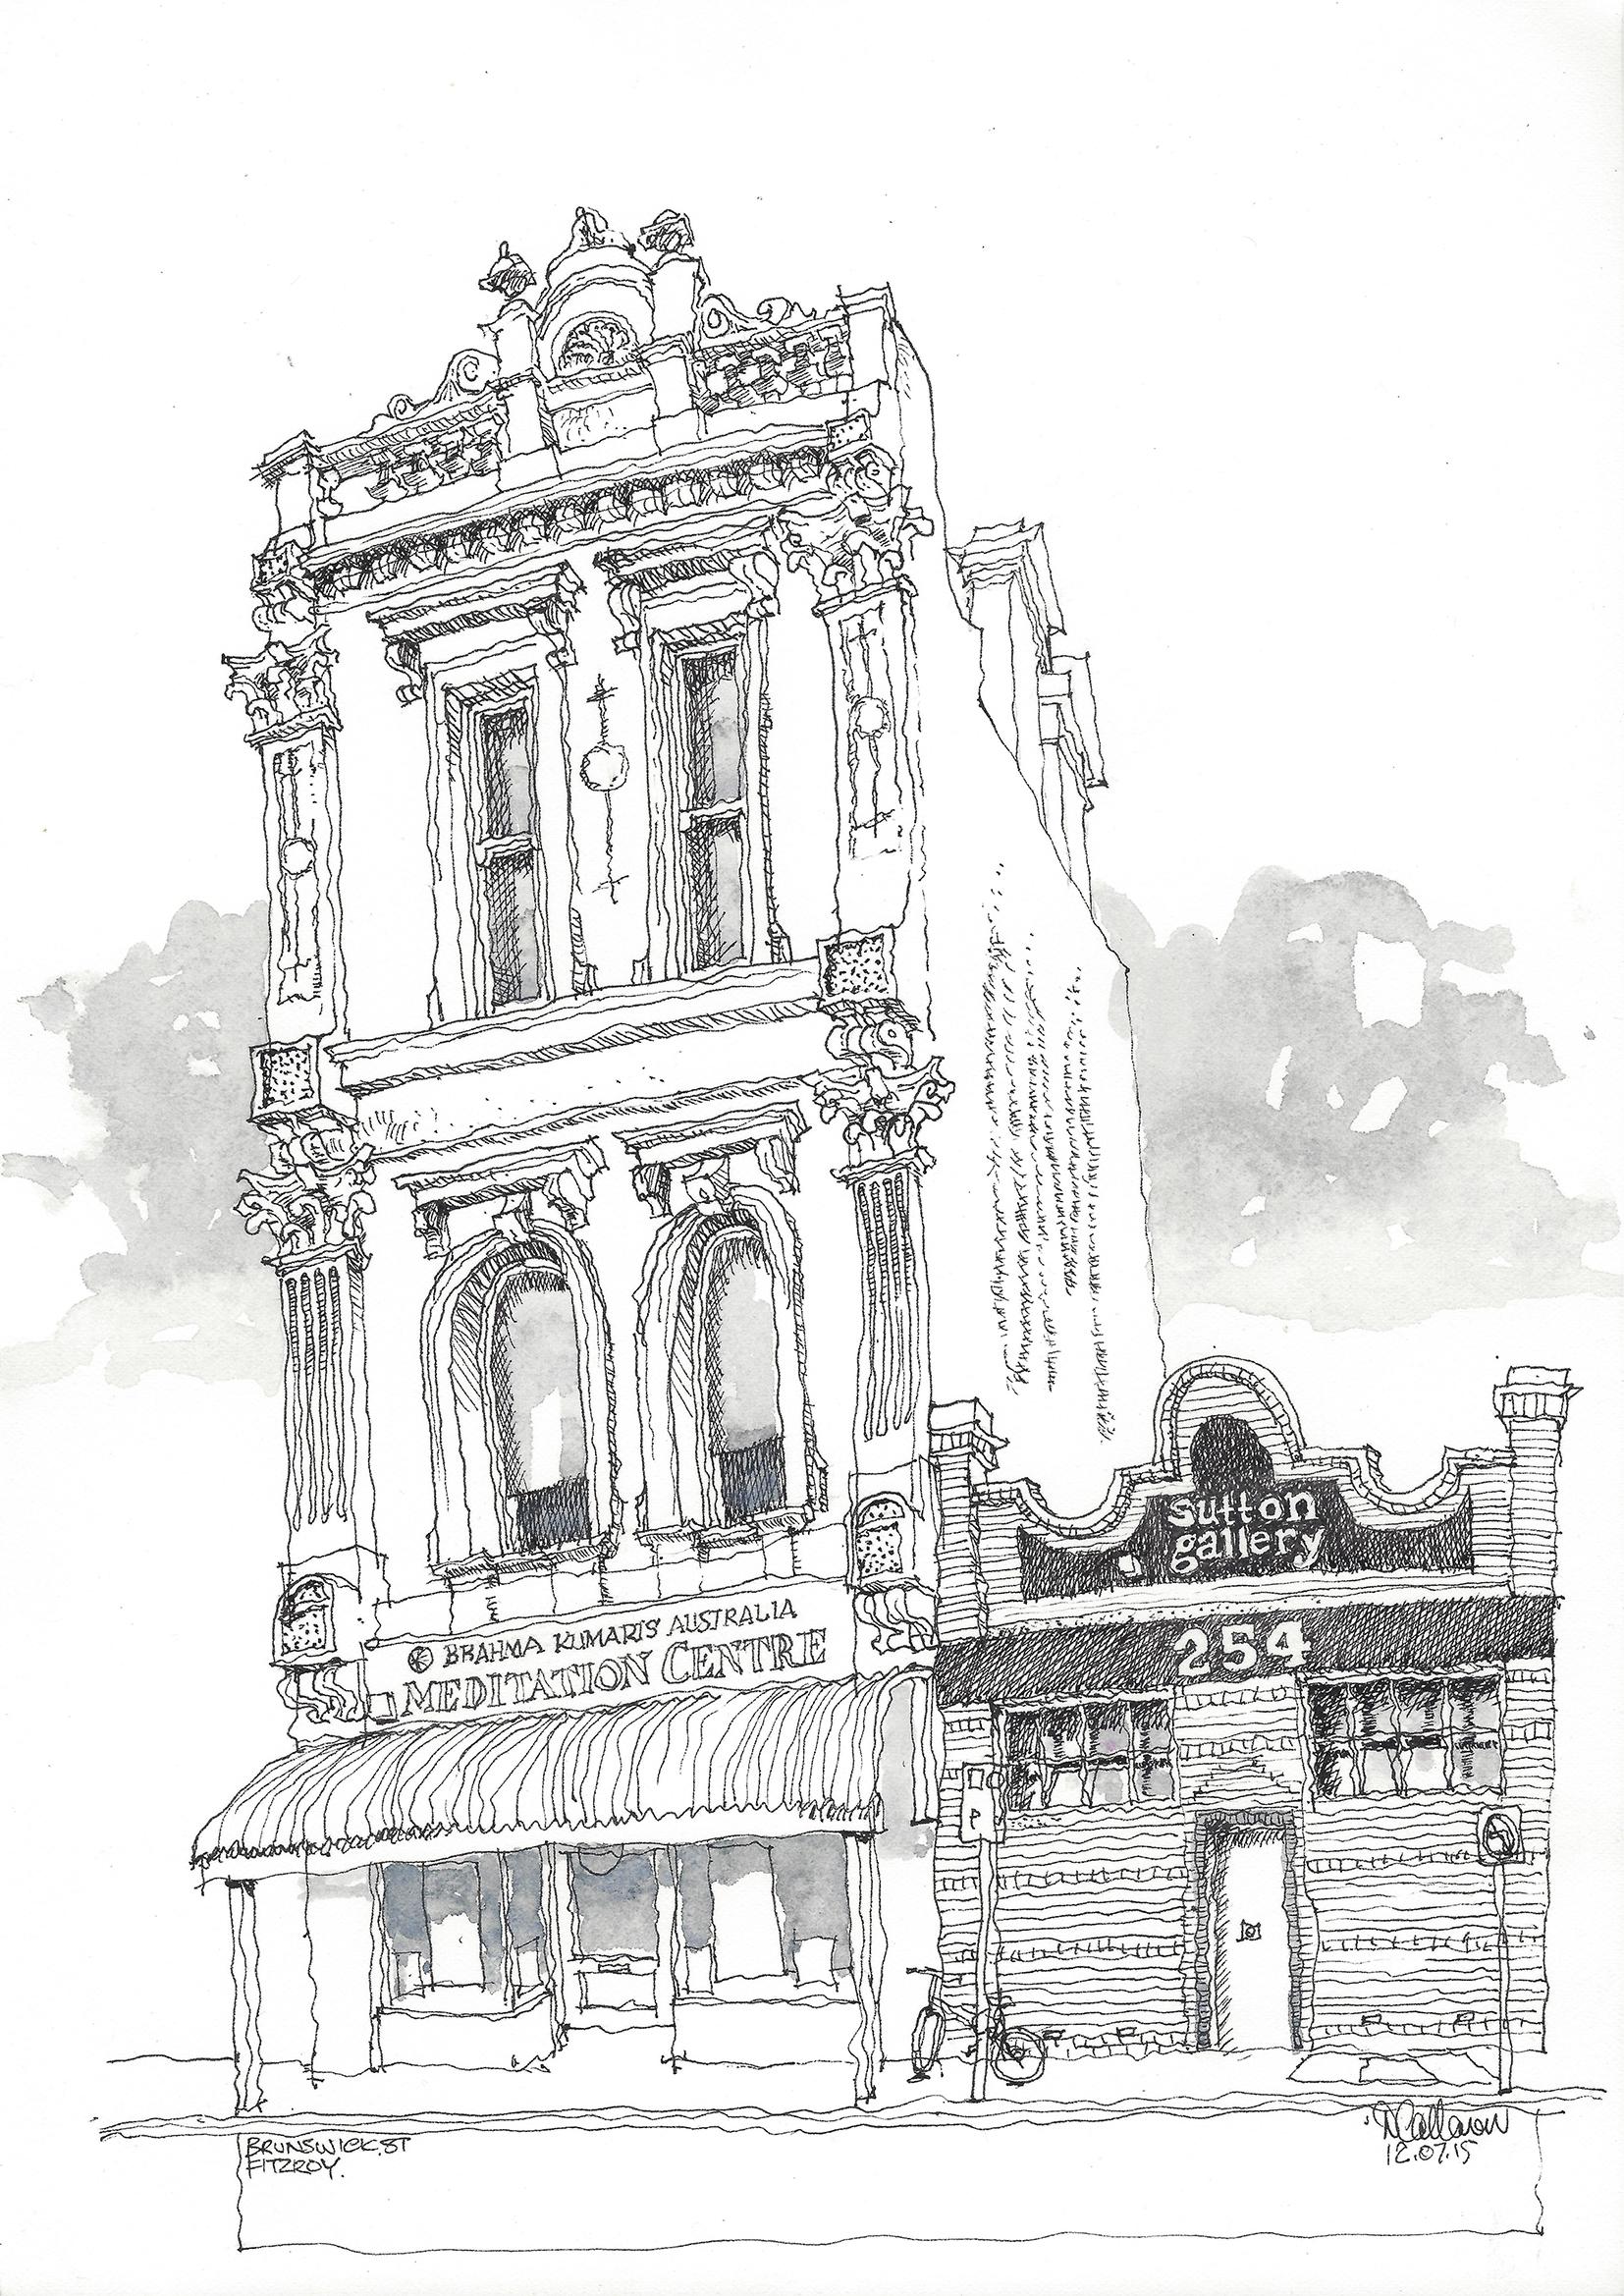 256,254-SuttonGallery-Print.jpg